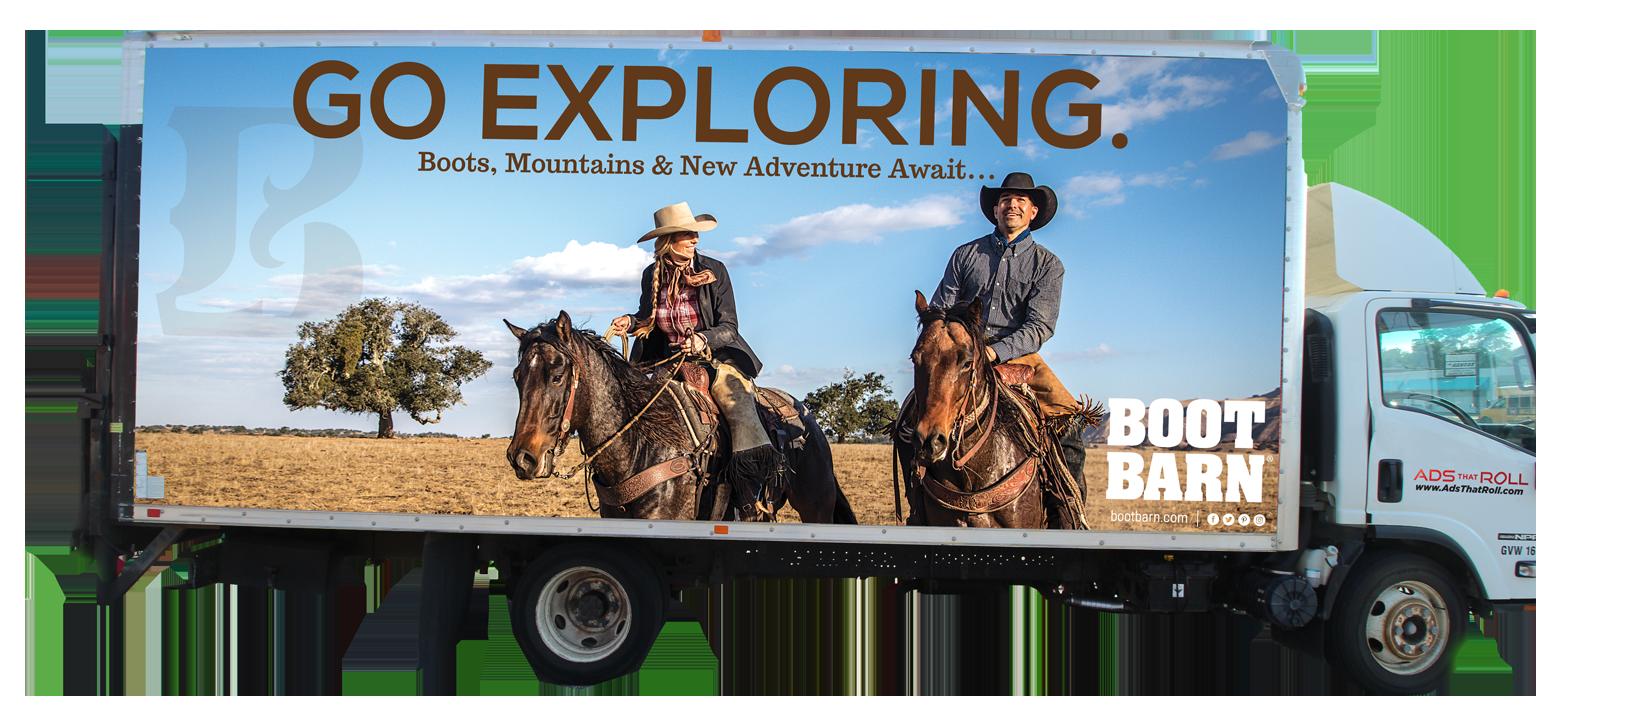 Boot Barn Ads that Roll Box Truck Advertisement